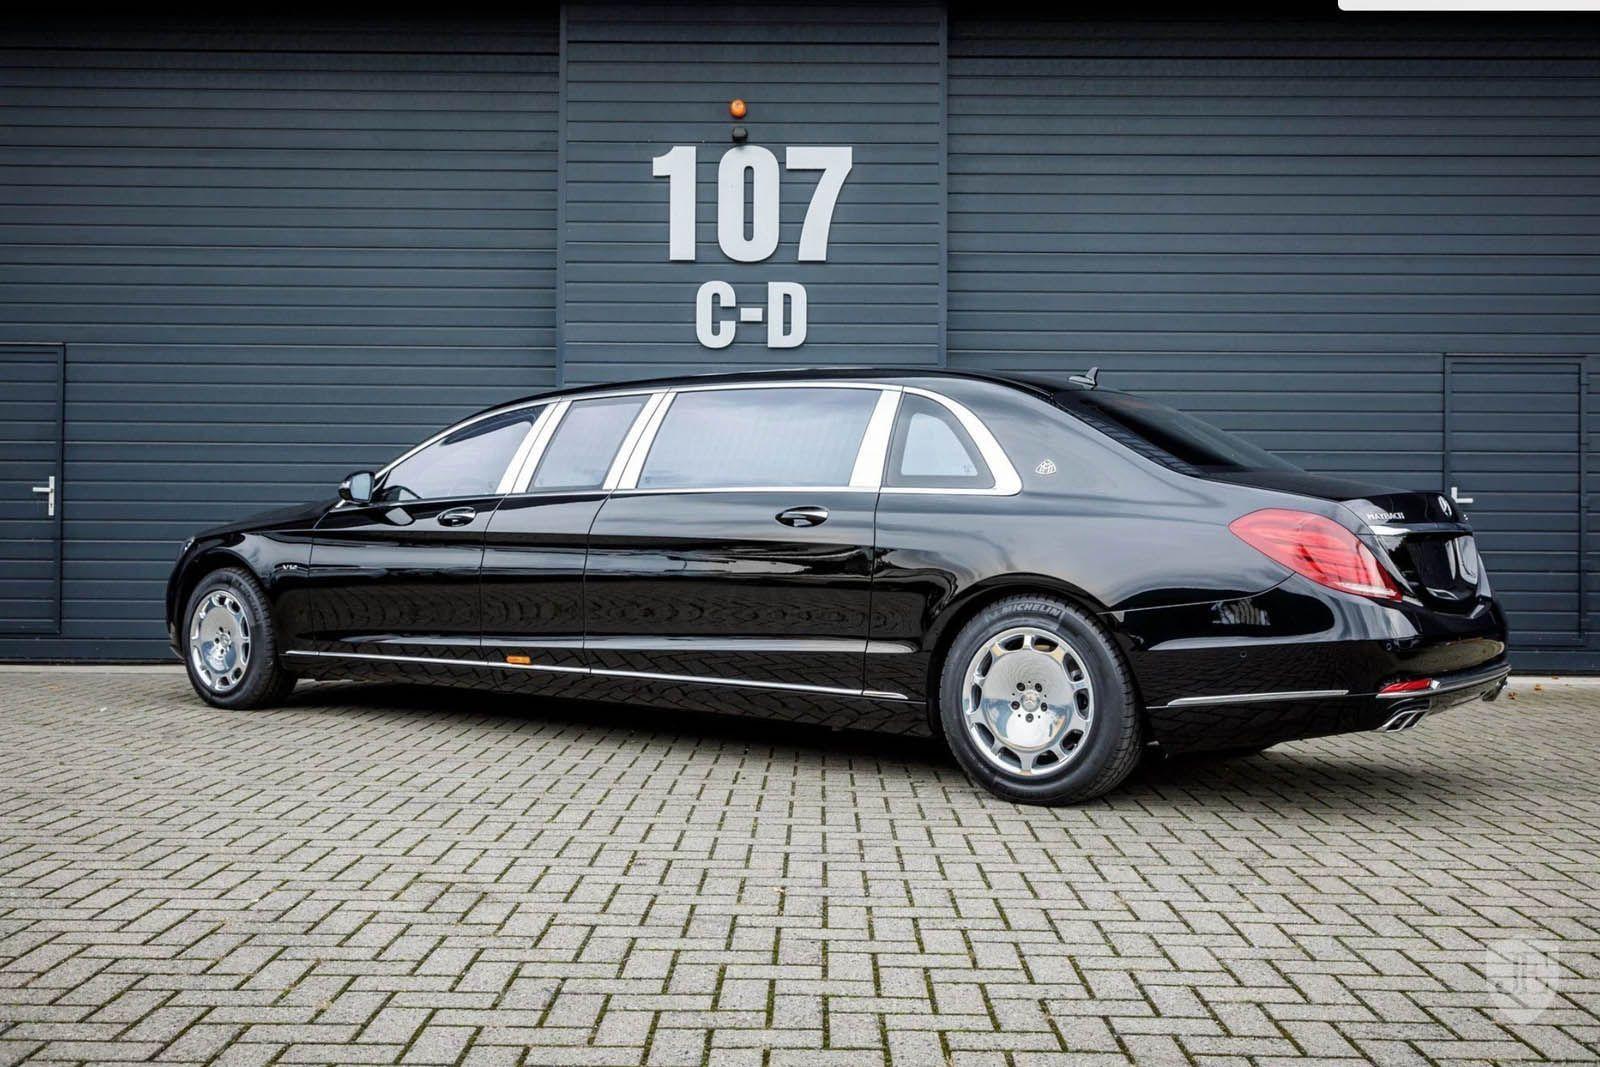 2017 mercedes benz-maybach s600 (w222) pullman limousine | merc benz